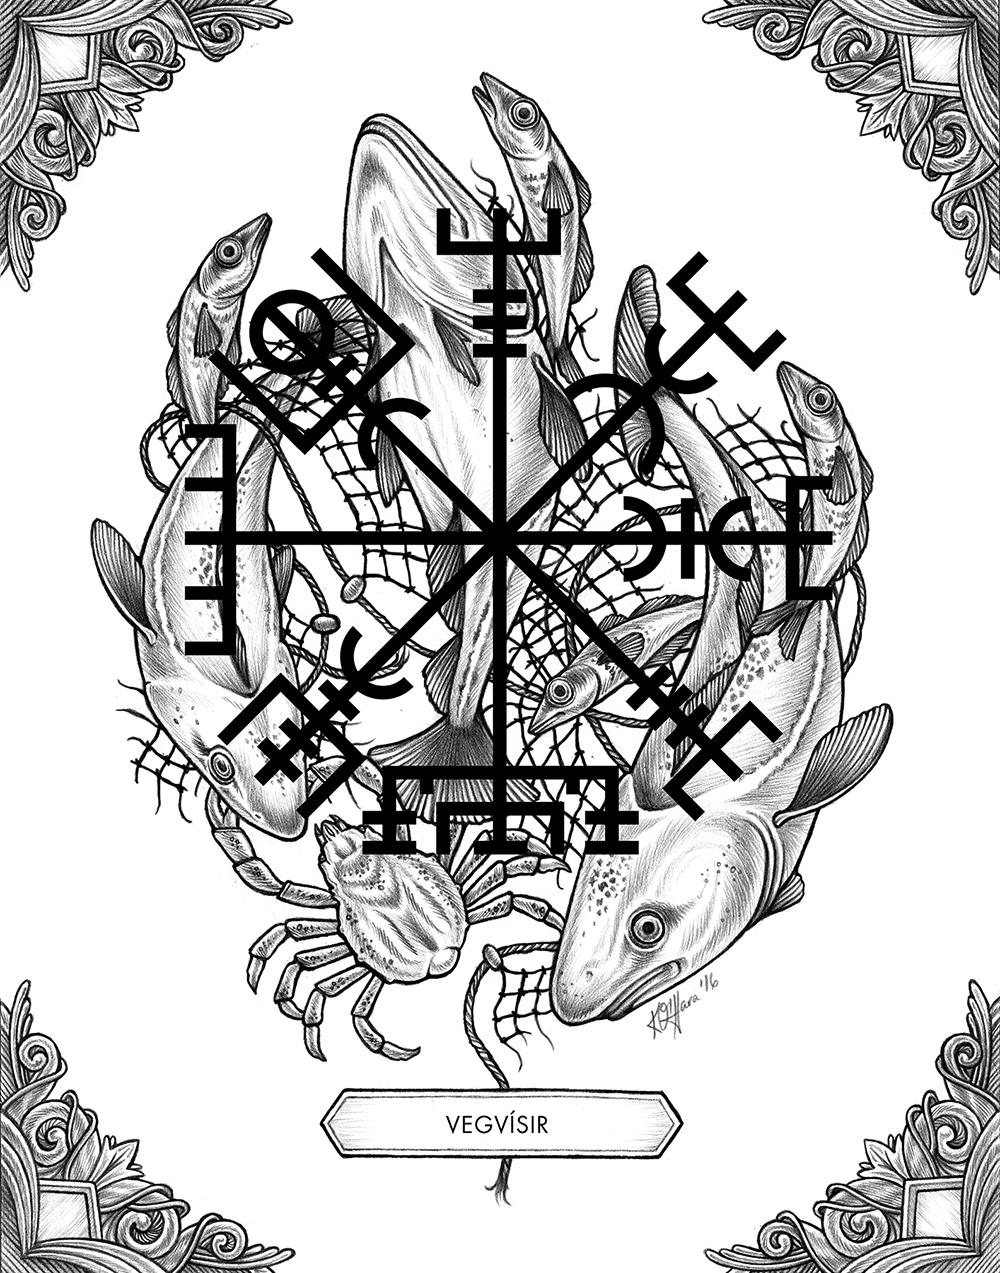 """Stafir Móti Aðsókn - To avoid ghosts and evil spirits"" by Kate O'Hara"